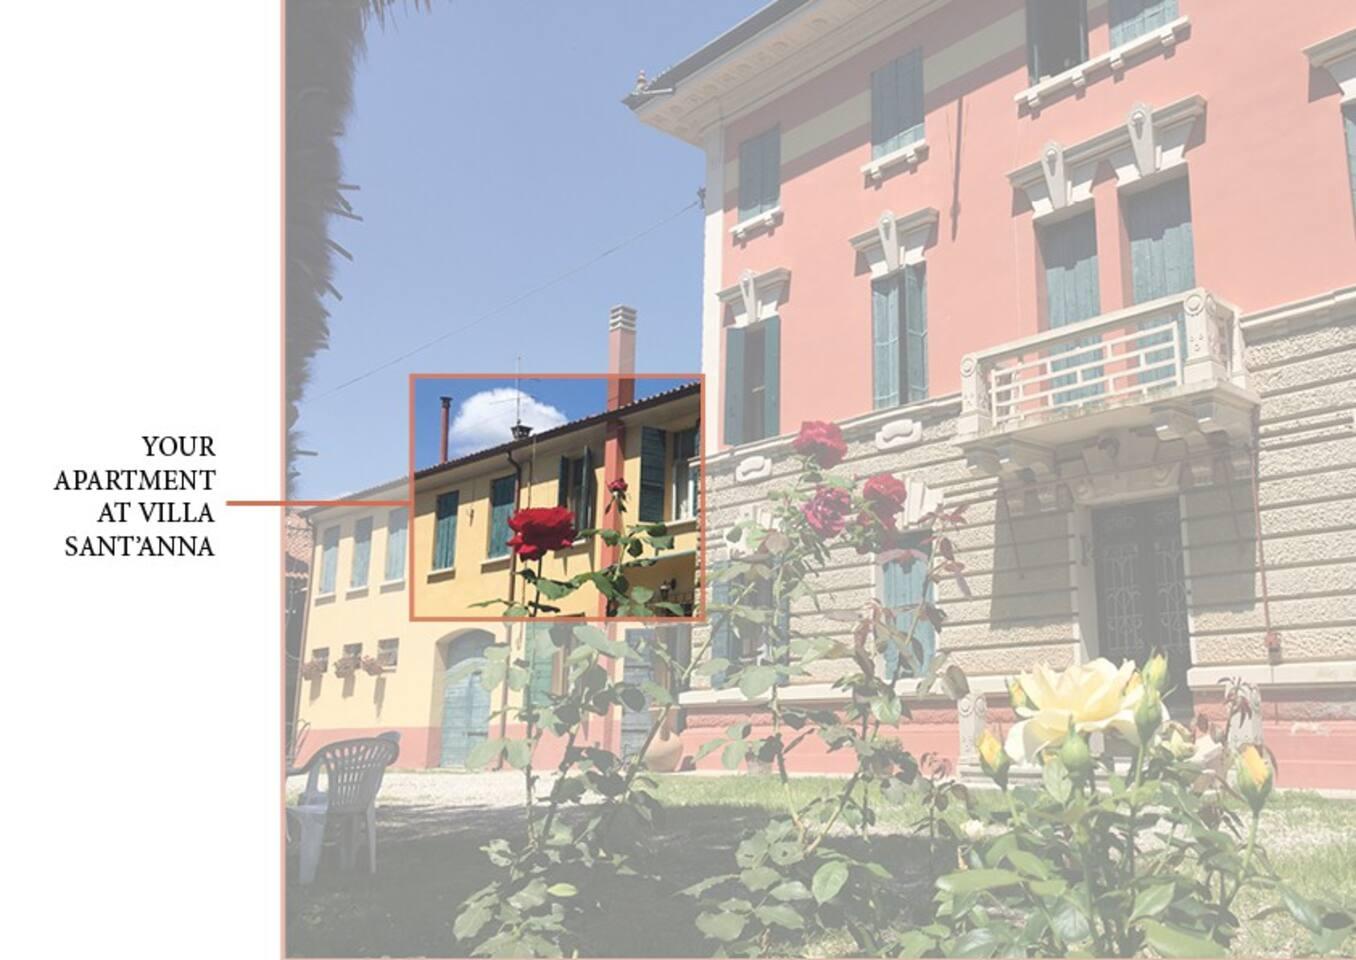 your apartment at Villa